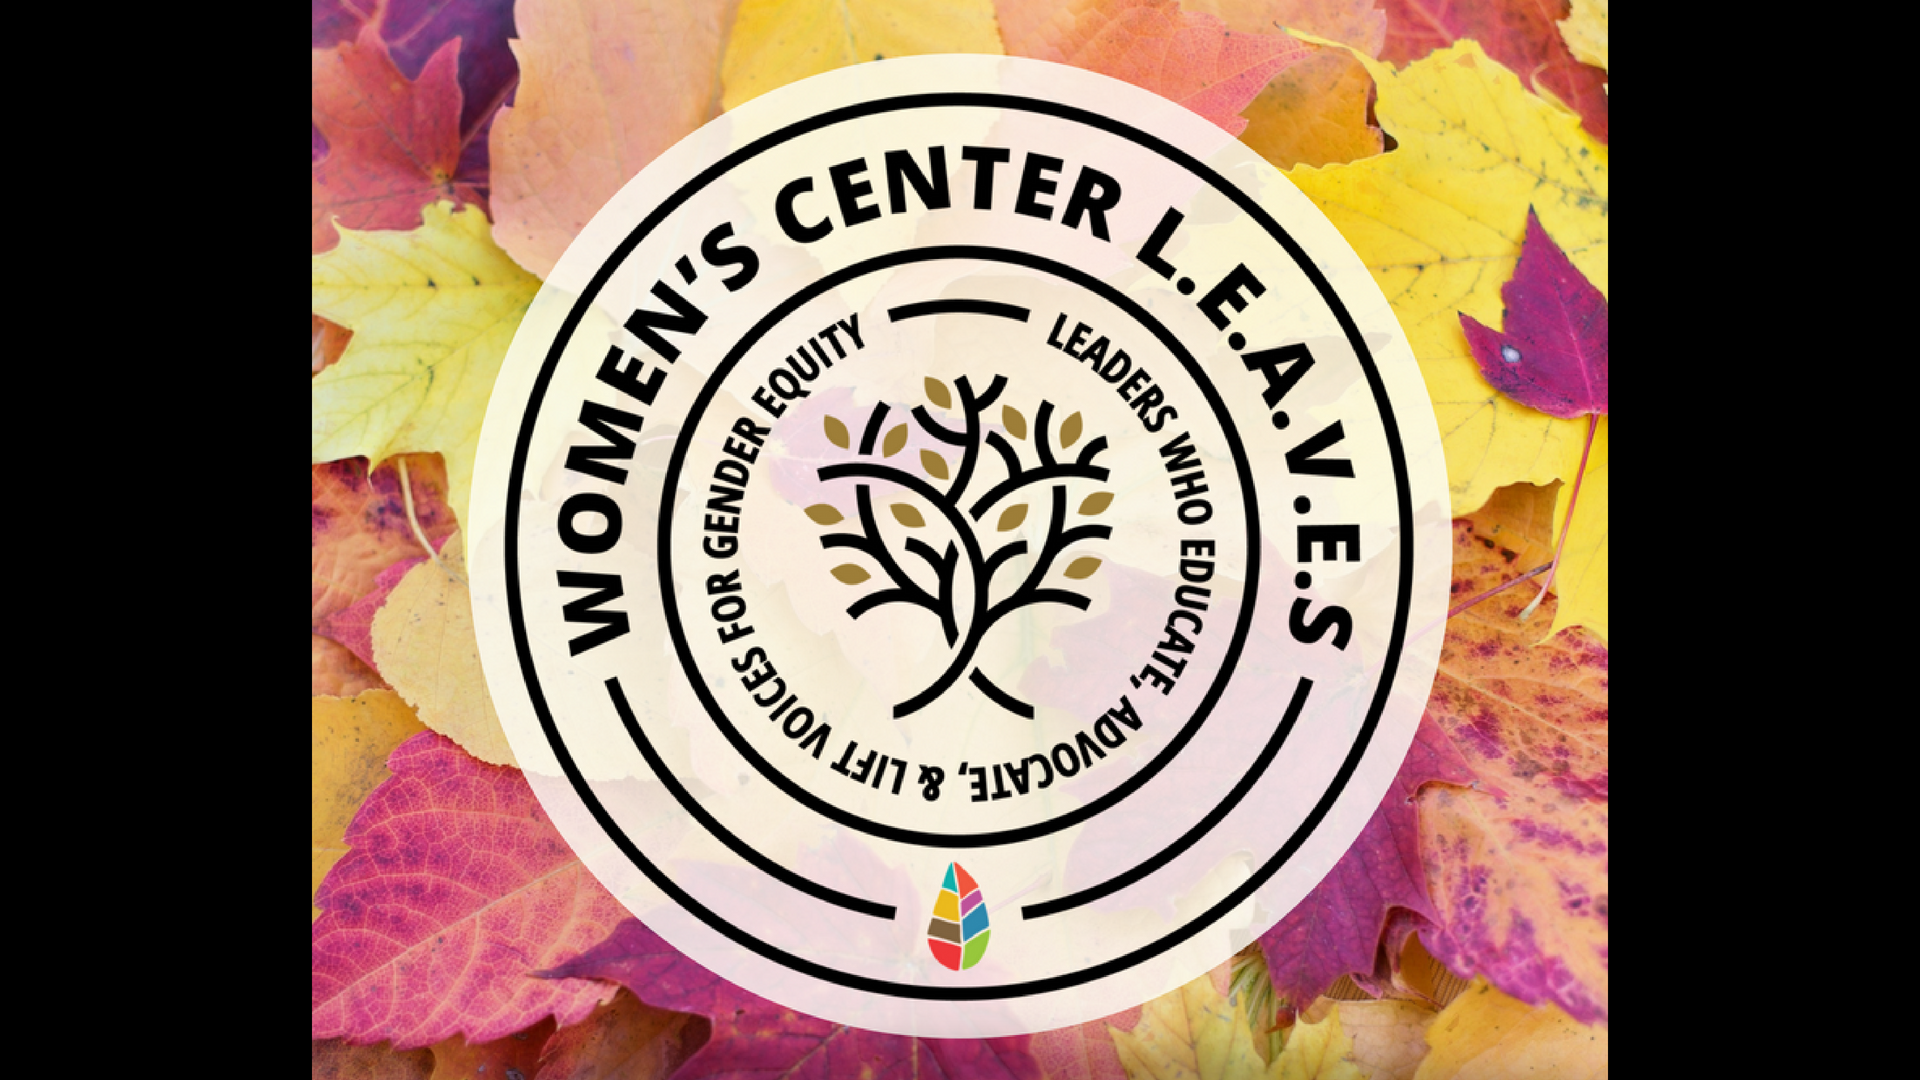 Apply to be part of the Women's Center L.E.A.V.E.s certified peer education program. (Apply from August 27 to September 23, 2018)